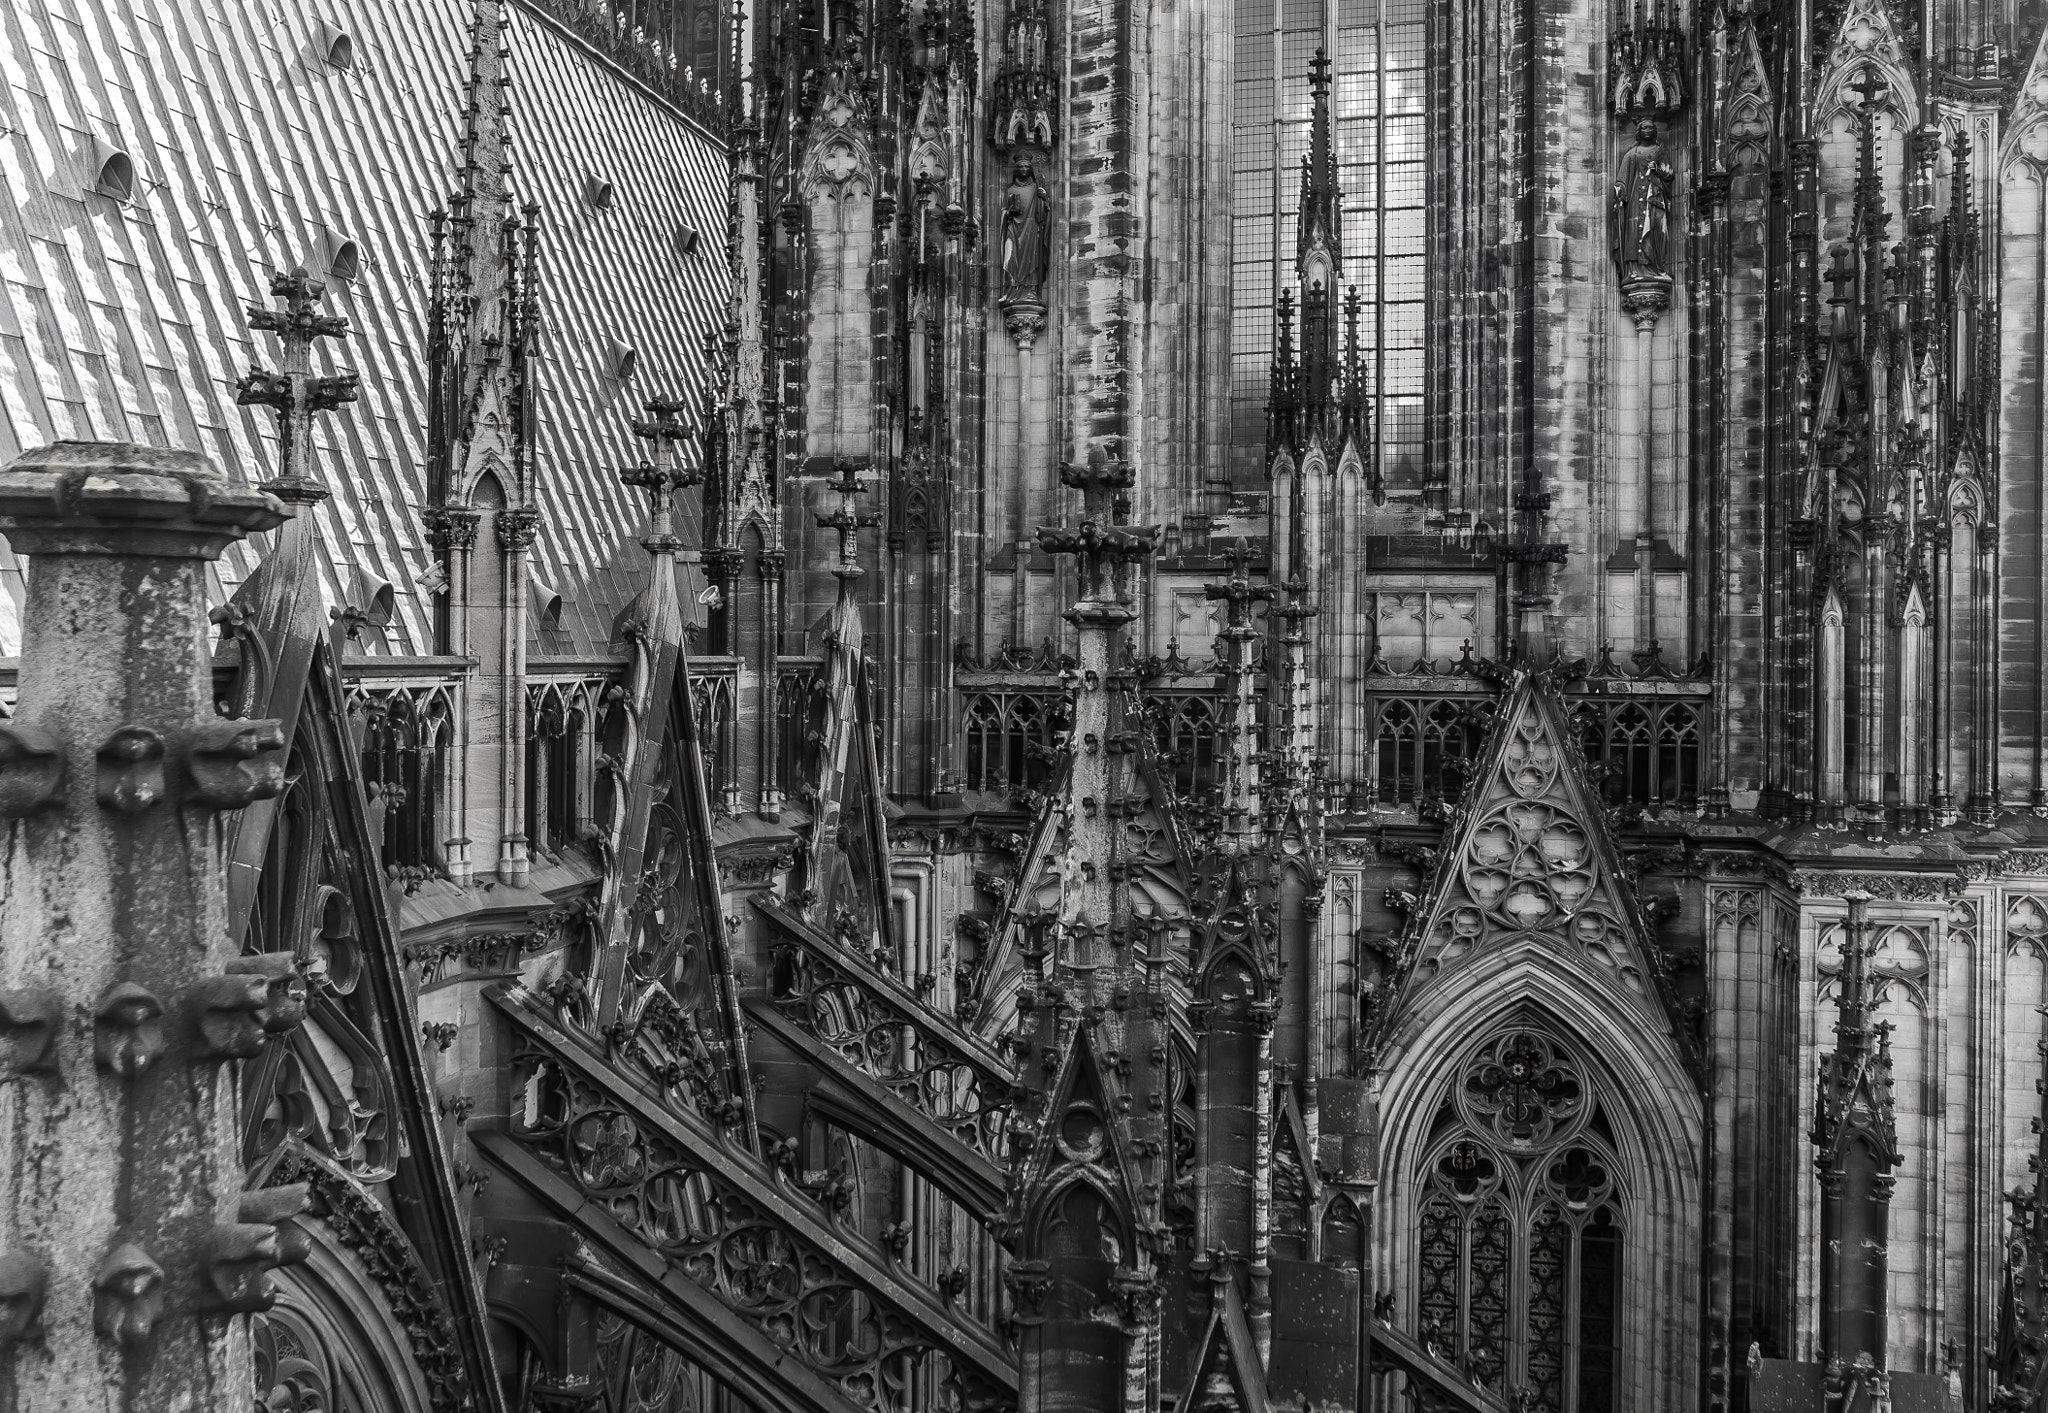 Facade Roof And Flying Buttresses Of Cologne Cathedral Fassade Dach Und Strebebogen Des Kolner Doms Facade Roof Flying Buttress Facade Cologne Cathedral